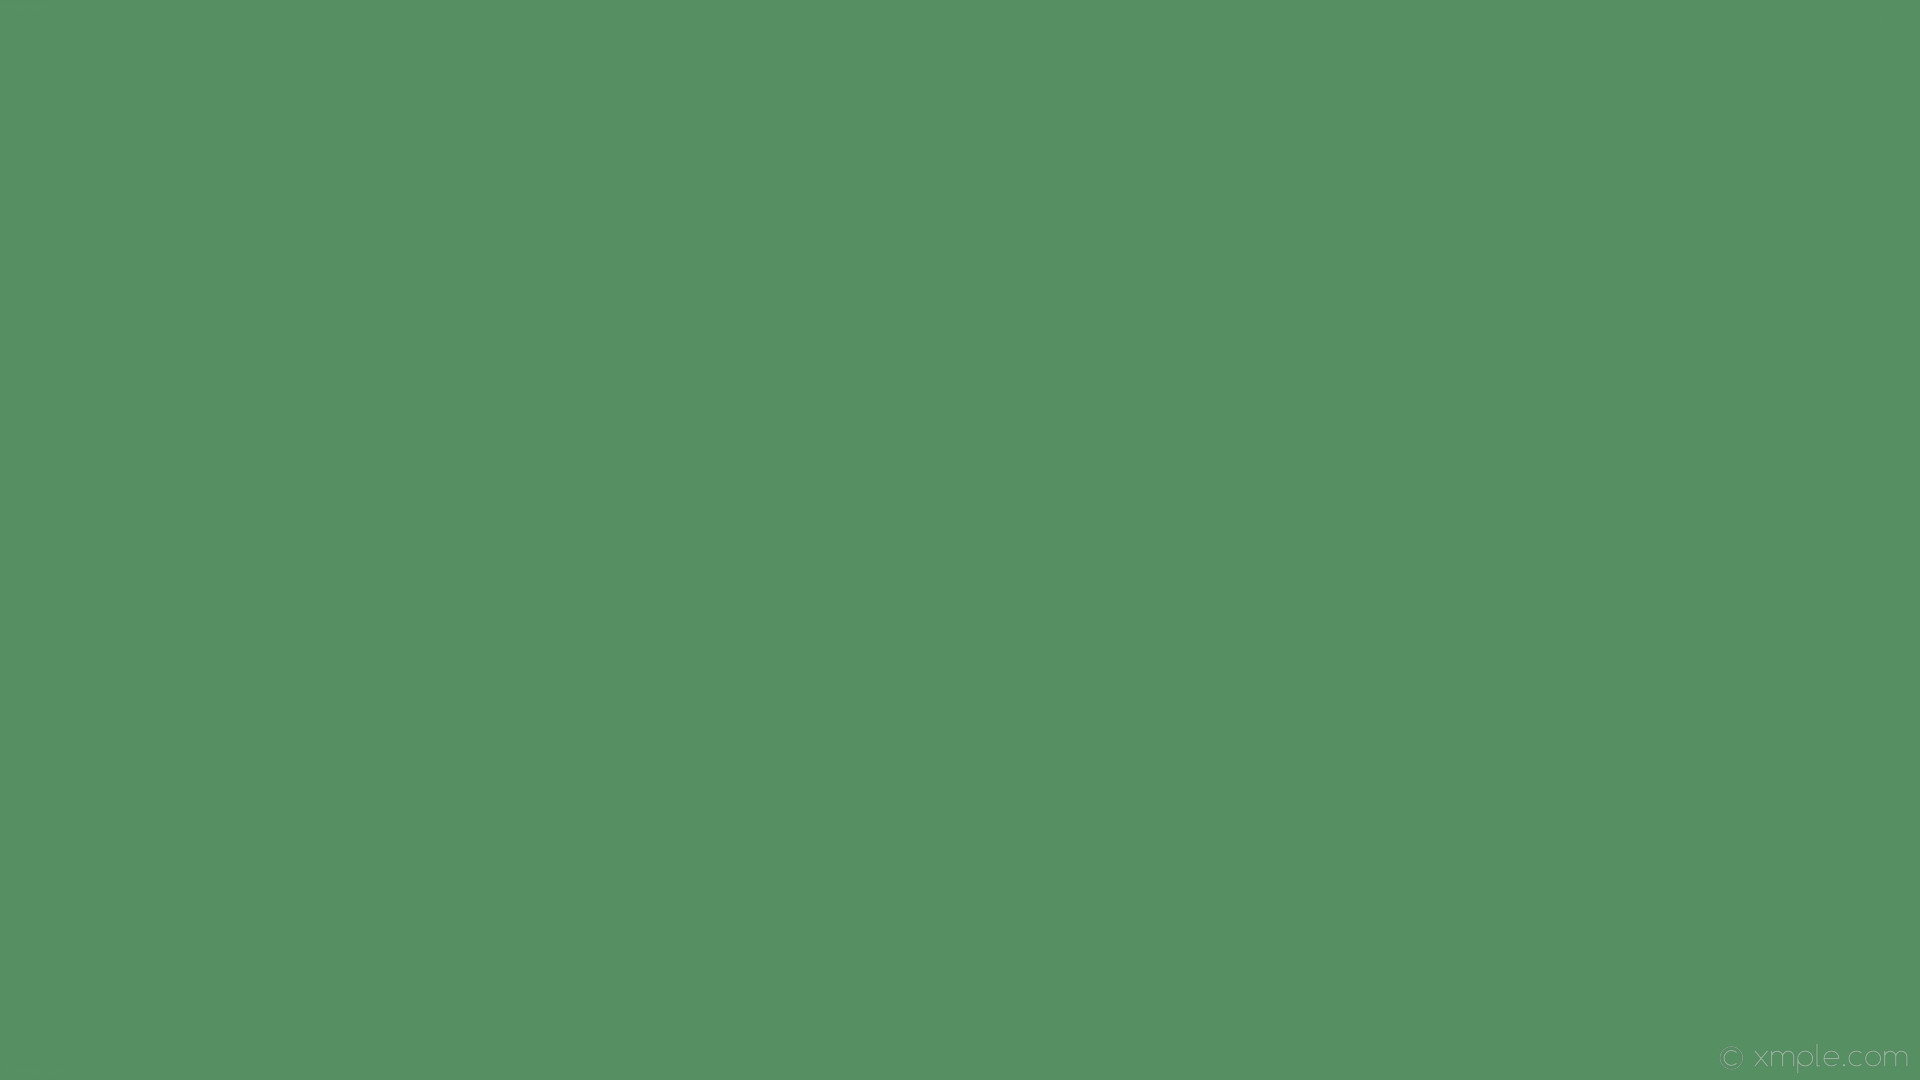 wallpaper single plain solid color green one colour #558f62